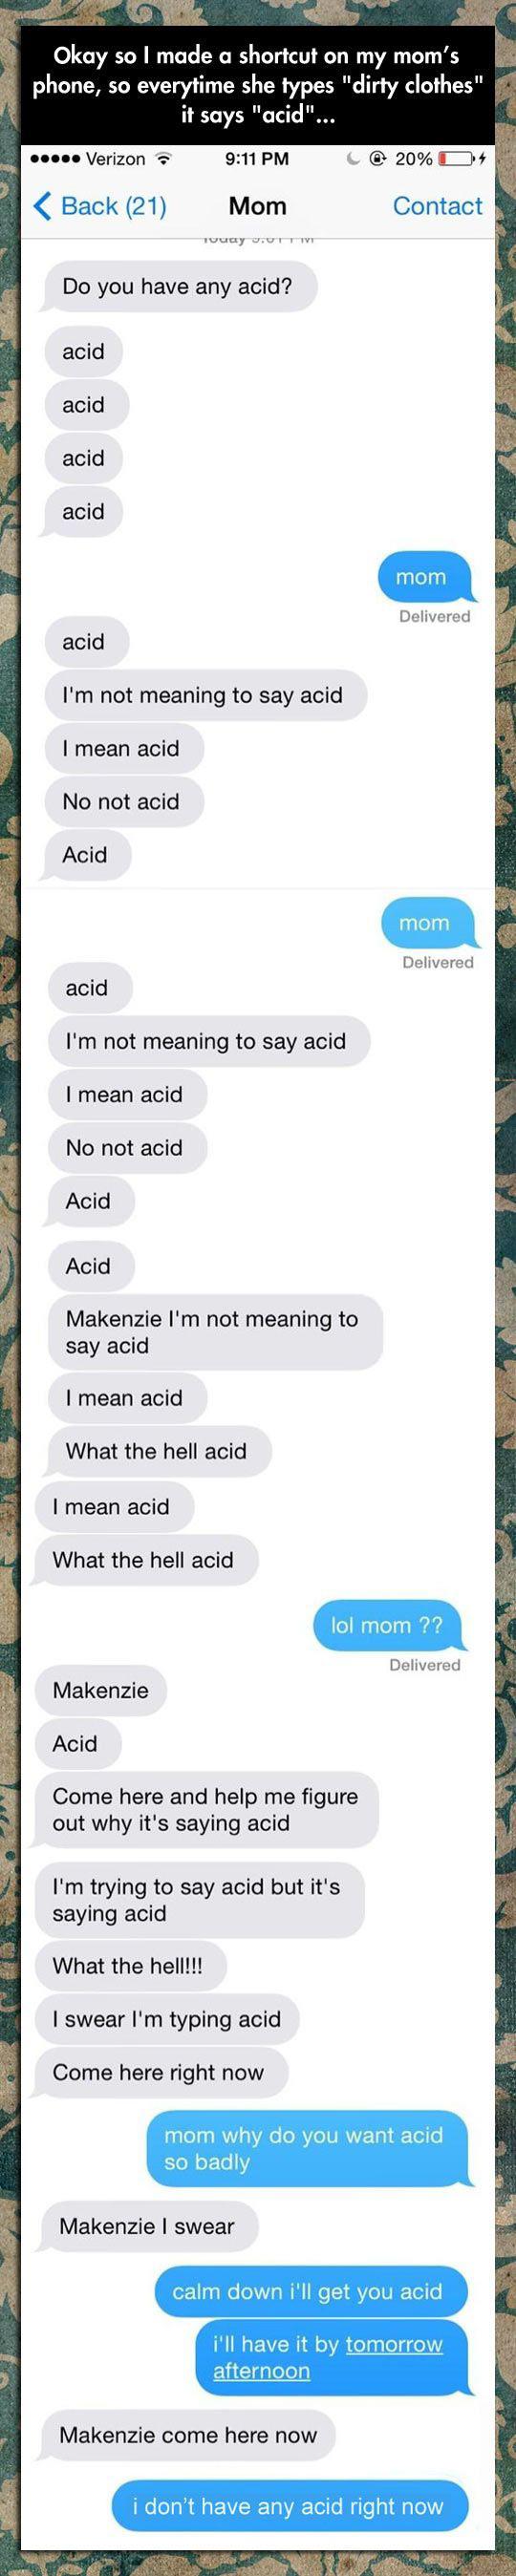 cool-acid-mother-word-change